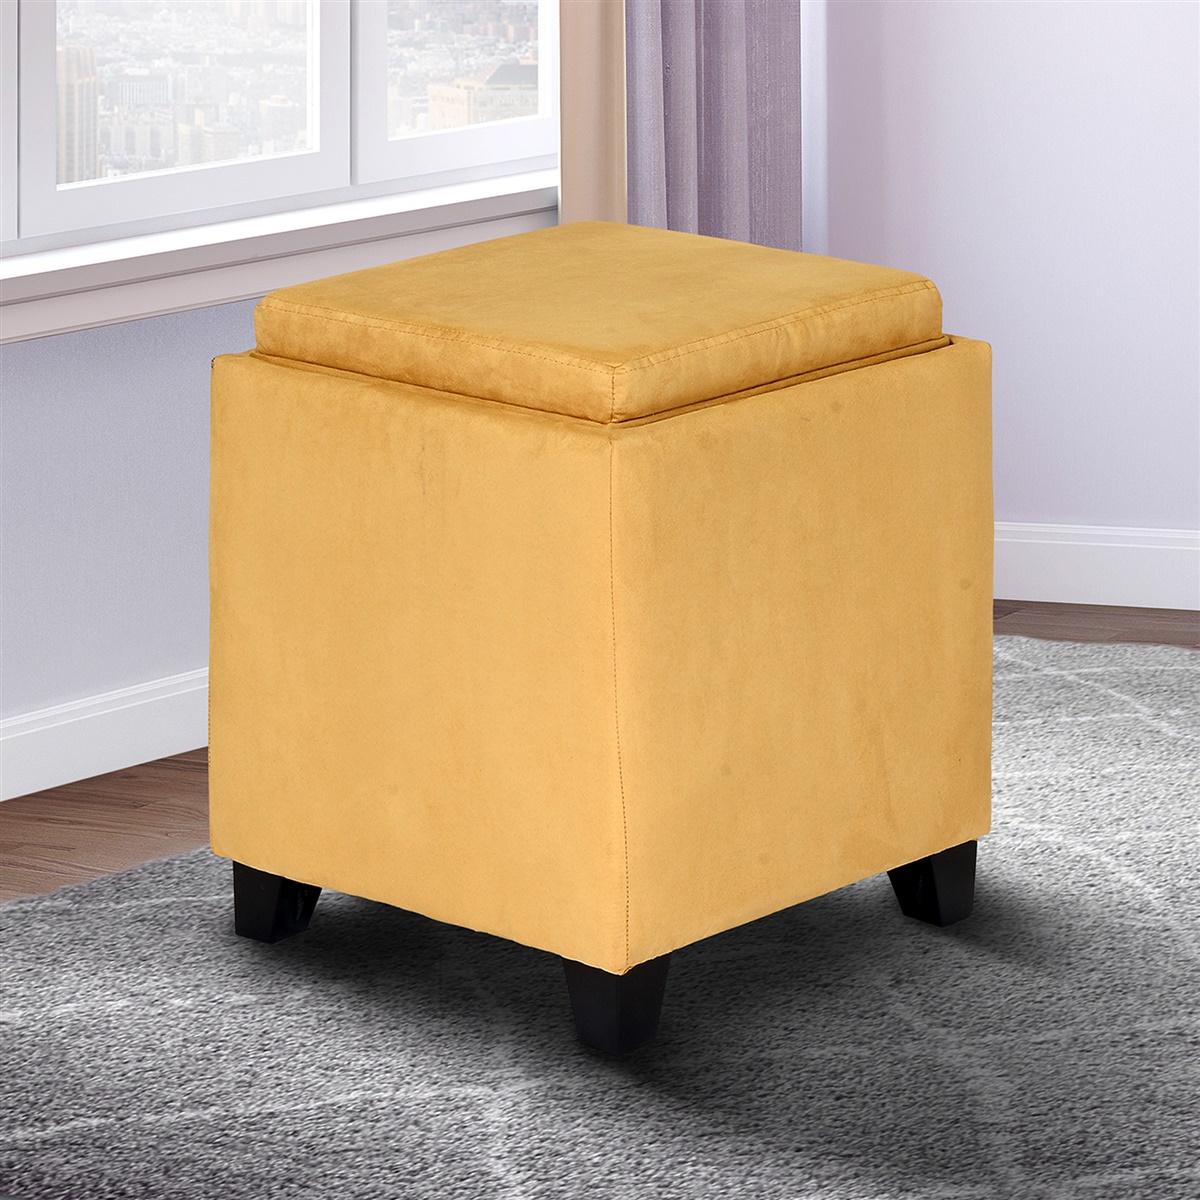 Superb Rainbow Microfiber Storage Ottoman With Tray Ibusinesslaw Wood Chair Design Ideas Ibusinesslaworg